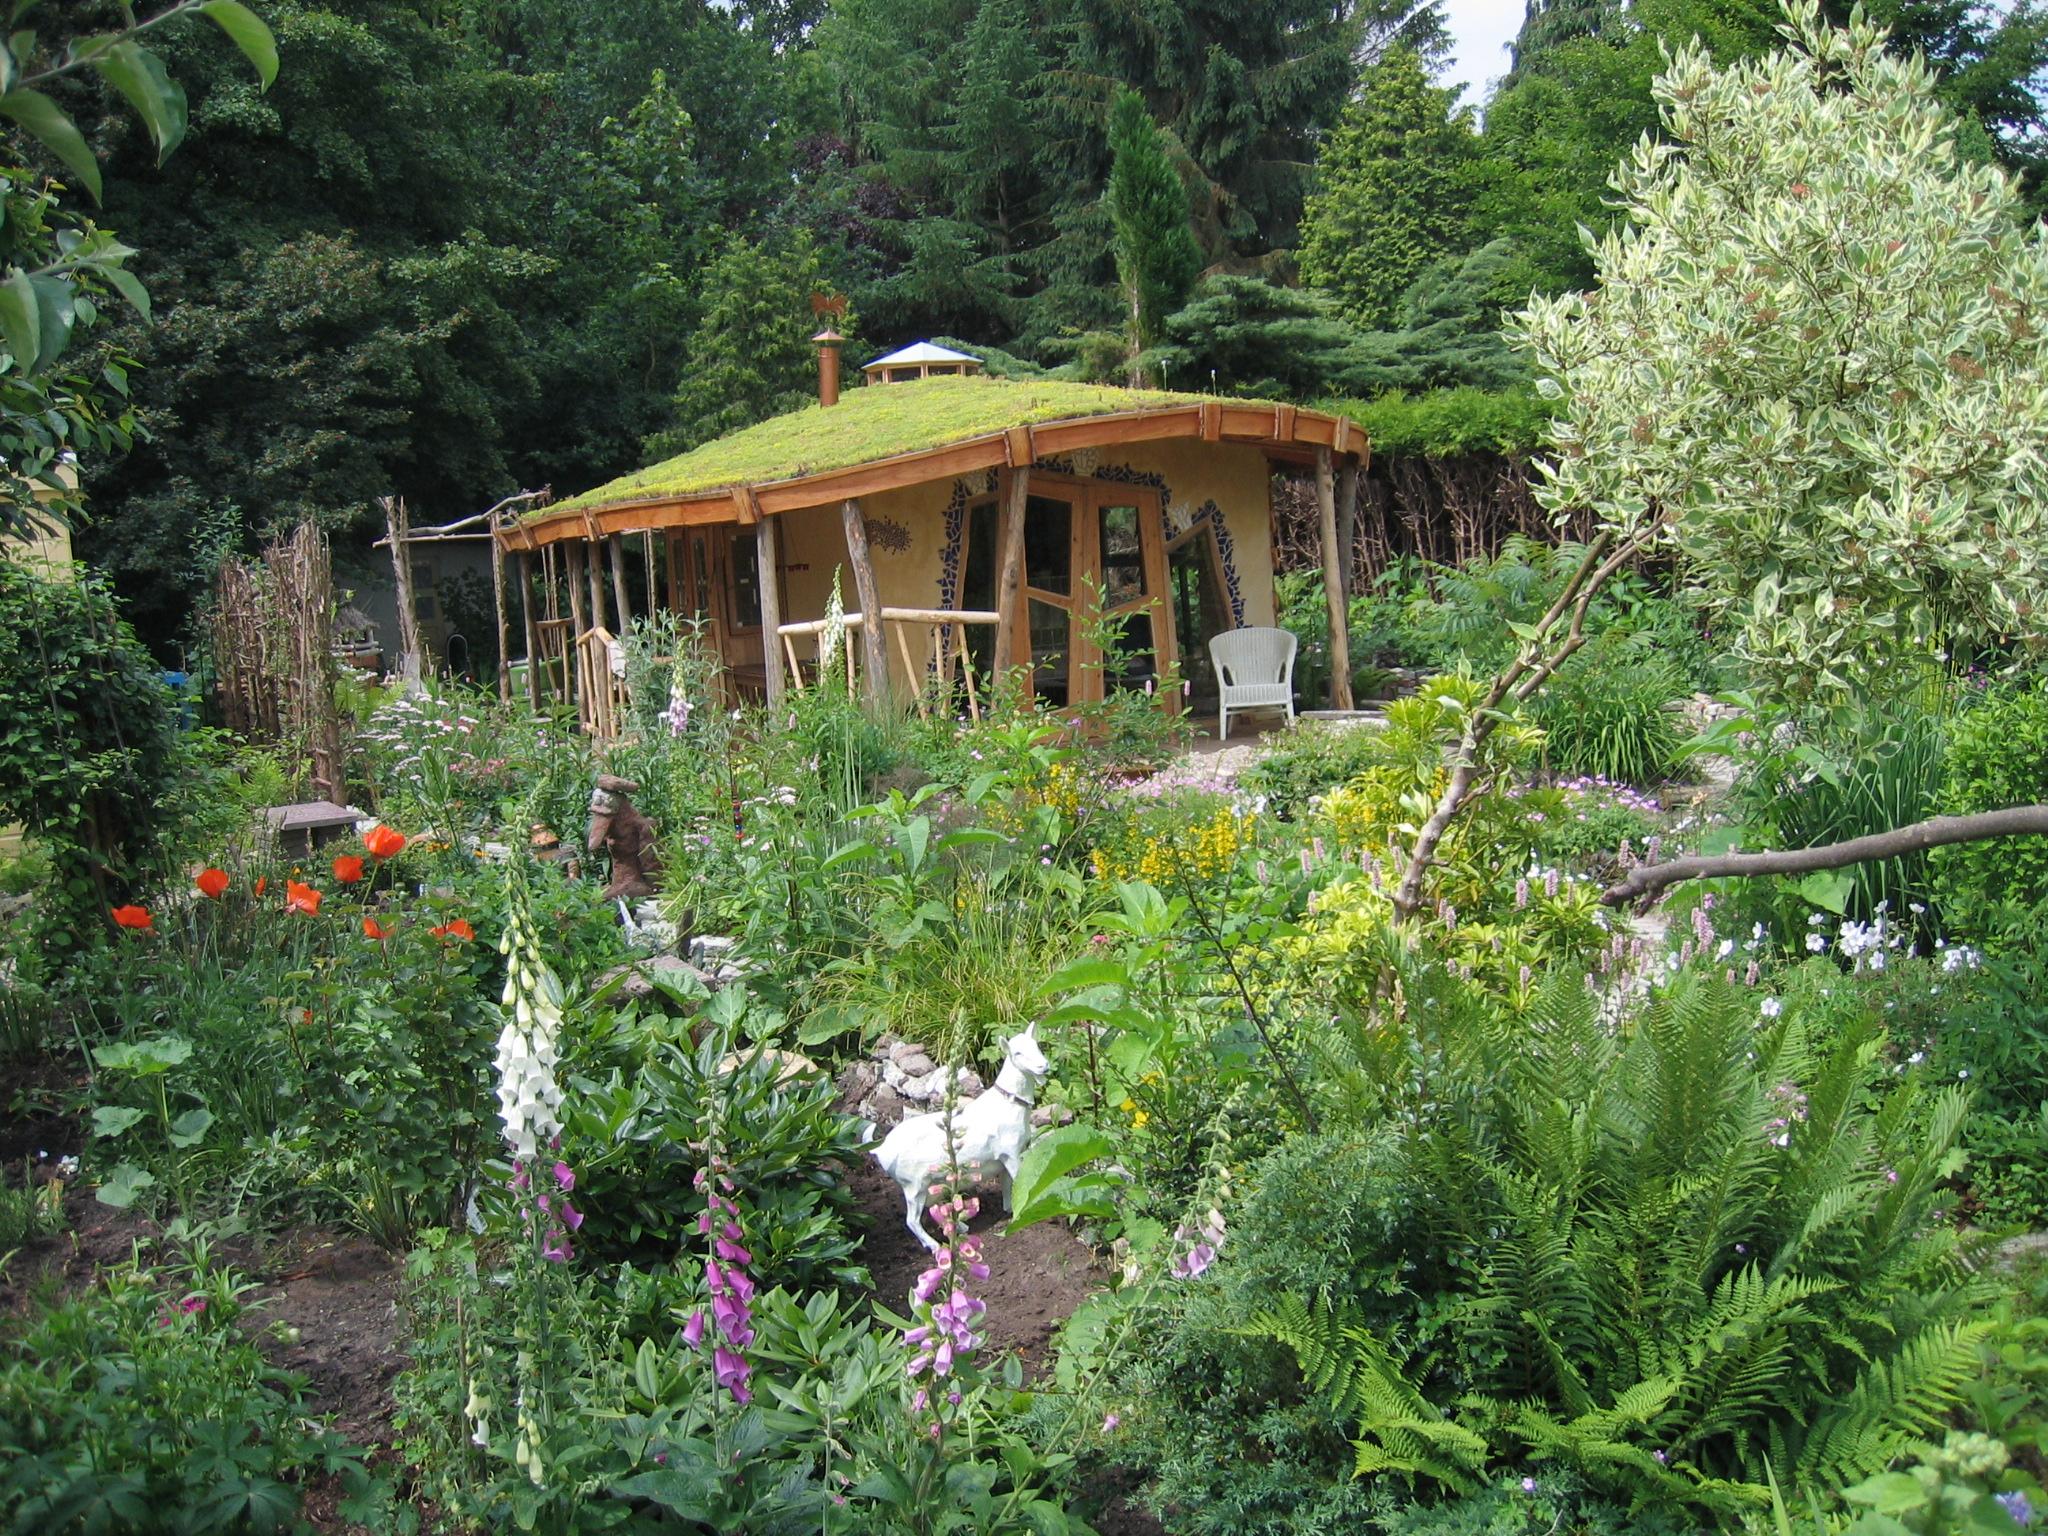 Siertuin met tuinhuis (met grasdak) op tuinpark Tuinwijck in Groningen